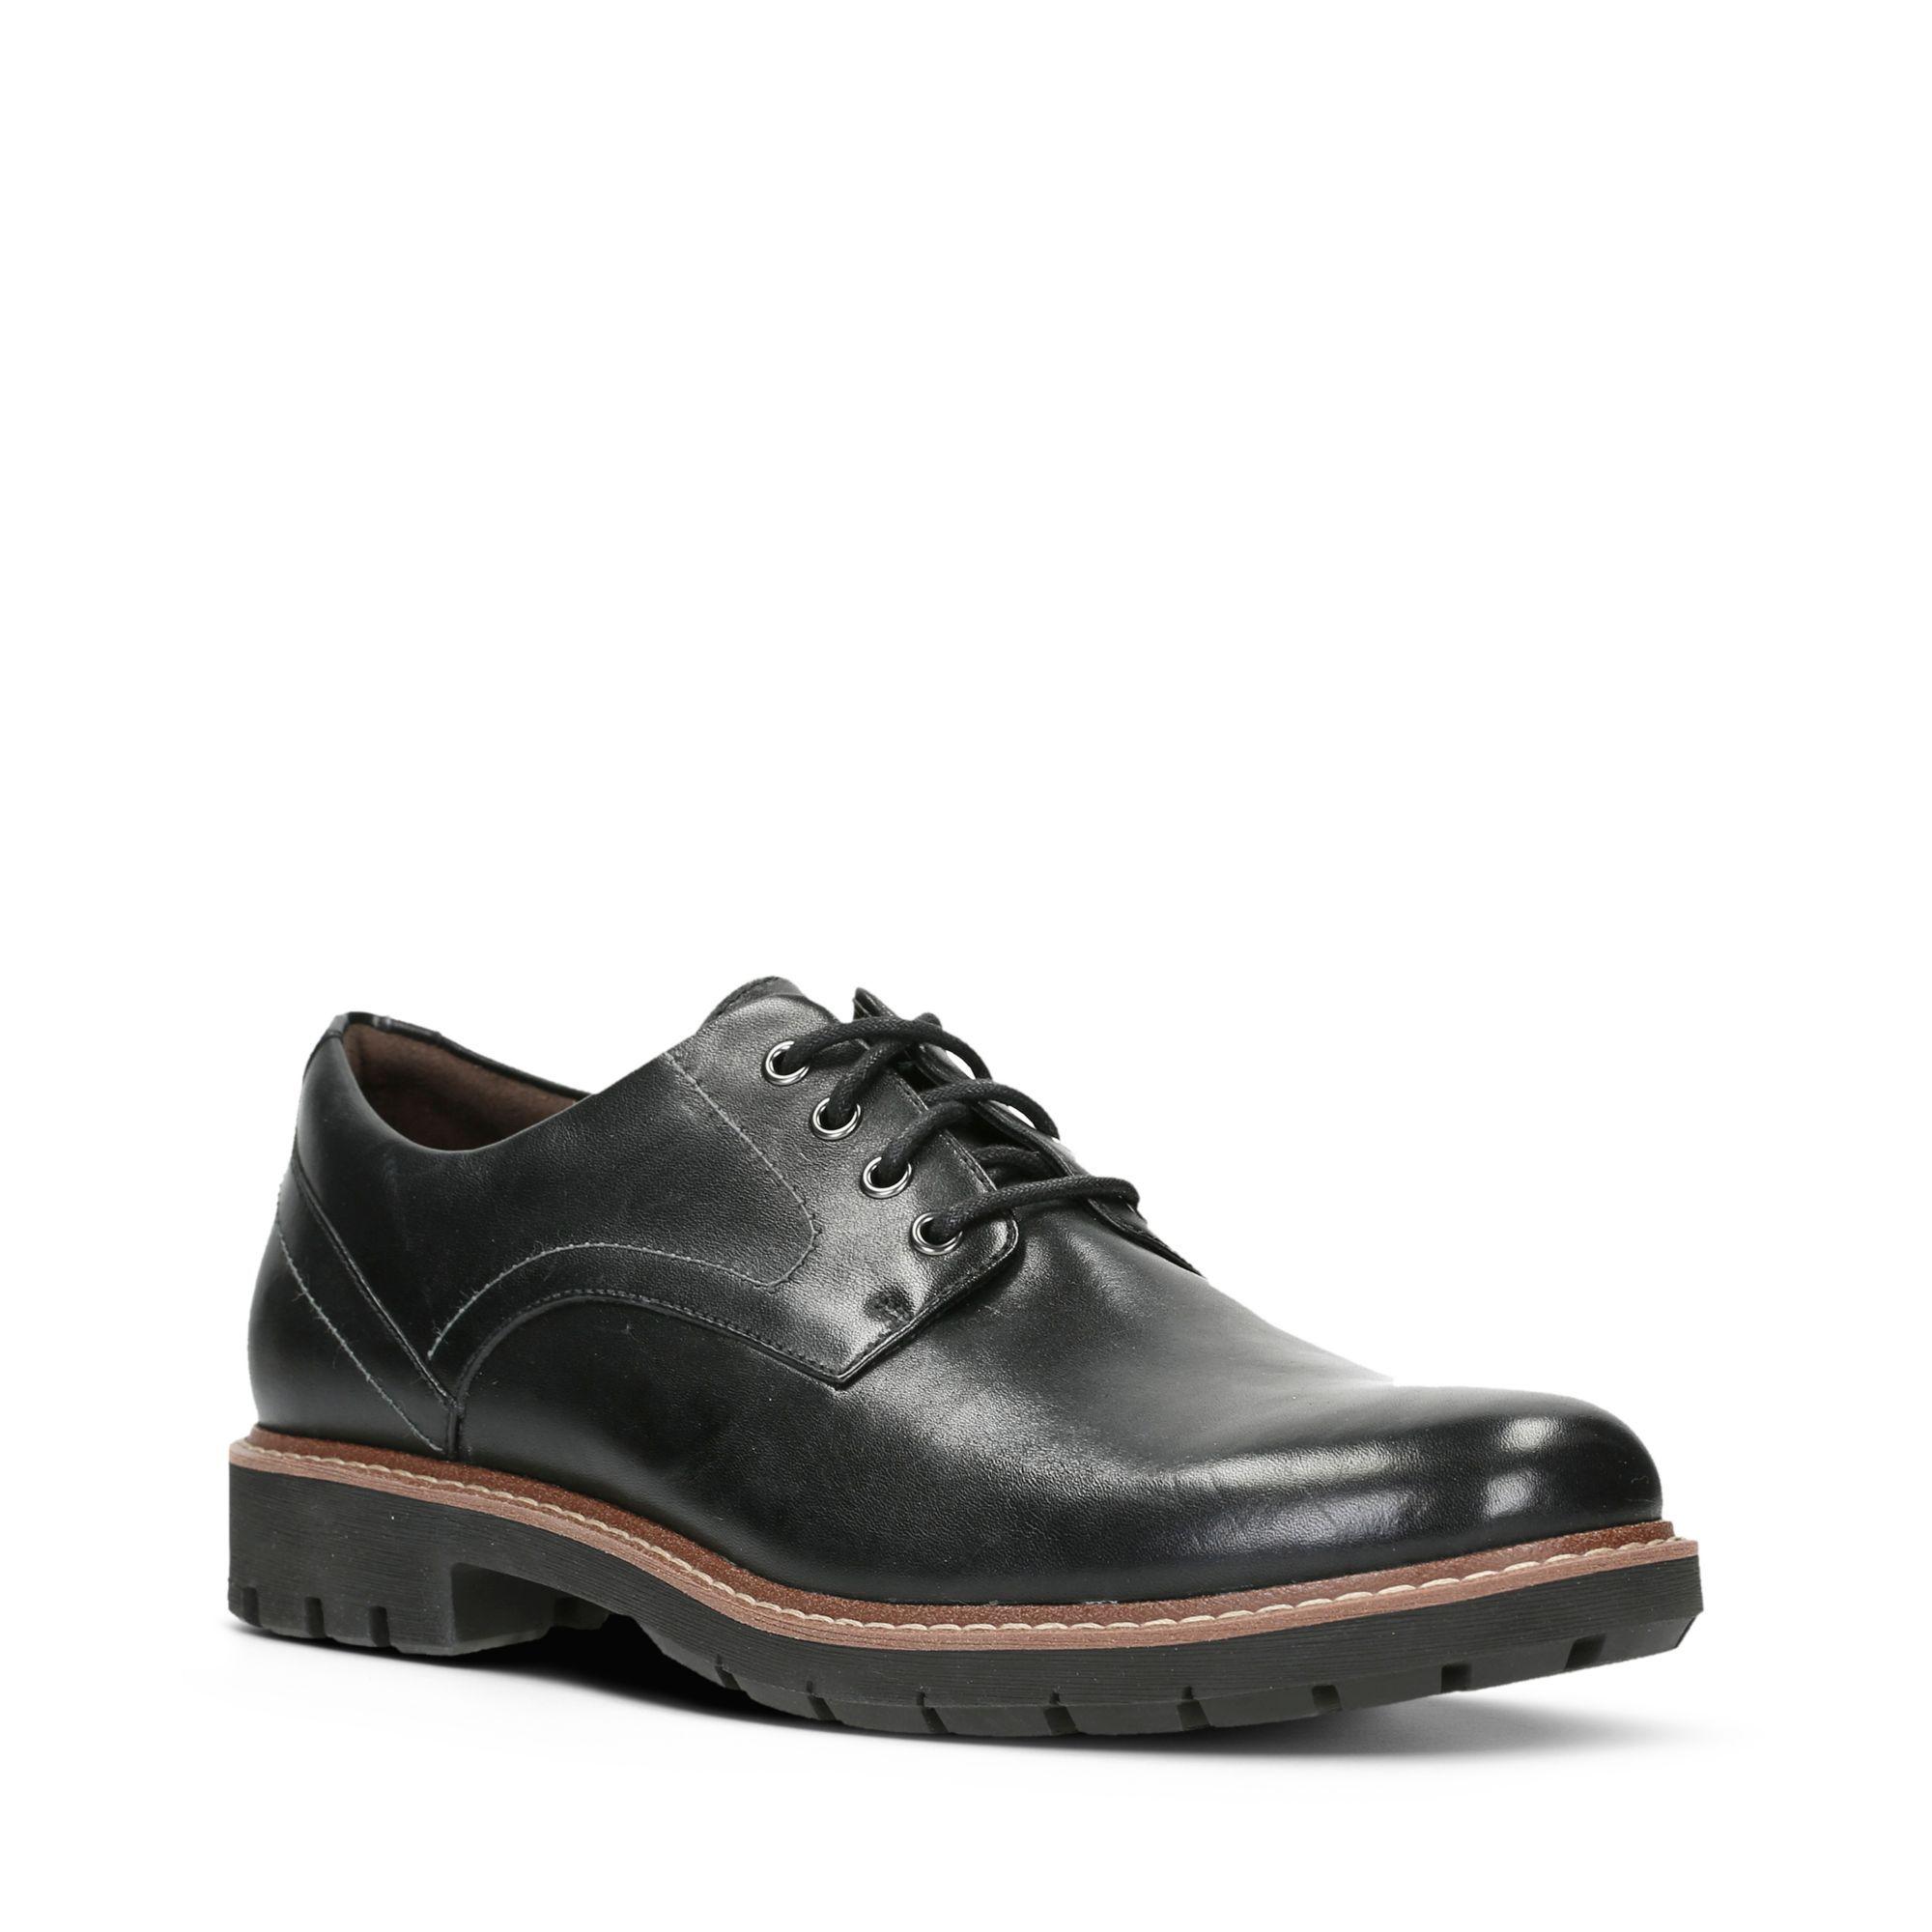 Clarks Men's Batcombe Hall Shoes Various Colours 5050409790120 - 6 UK Black